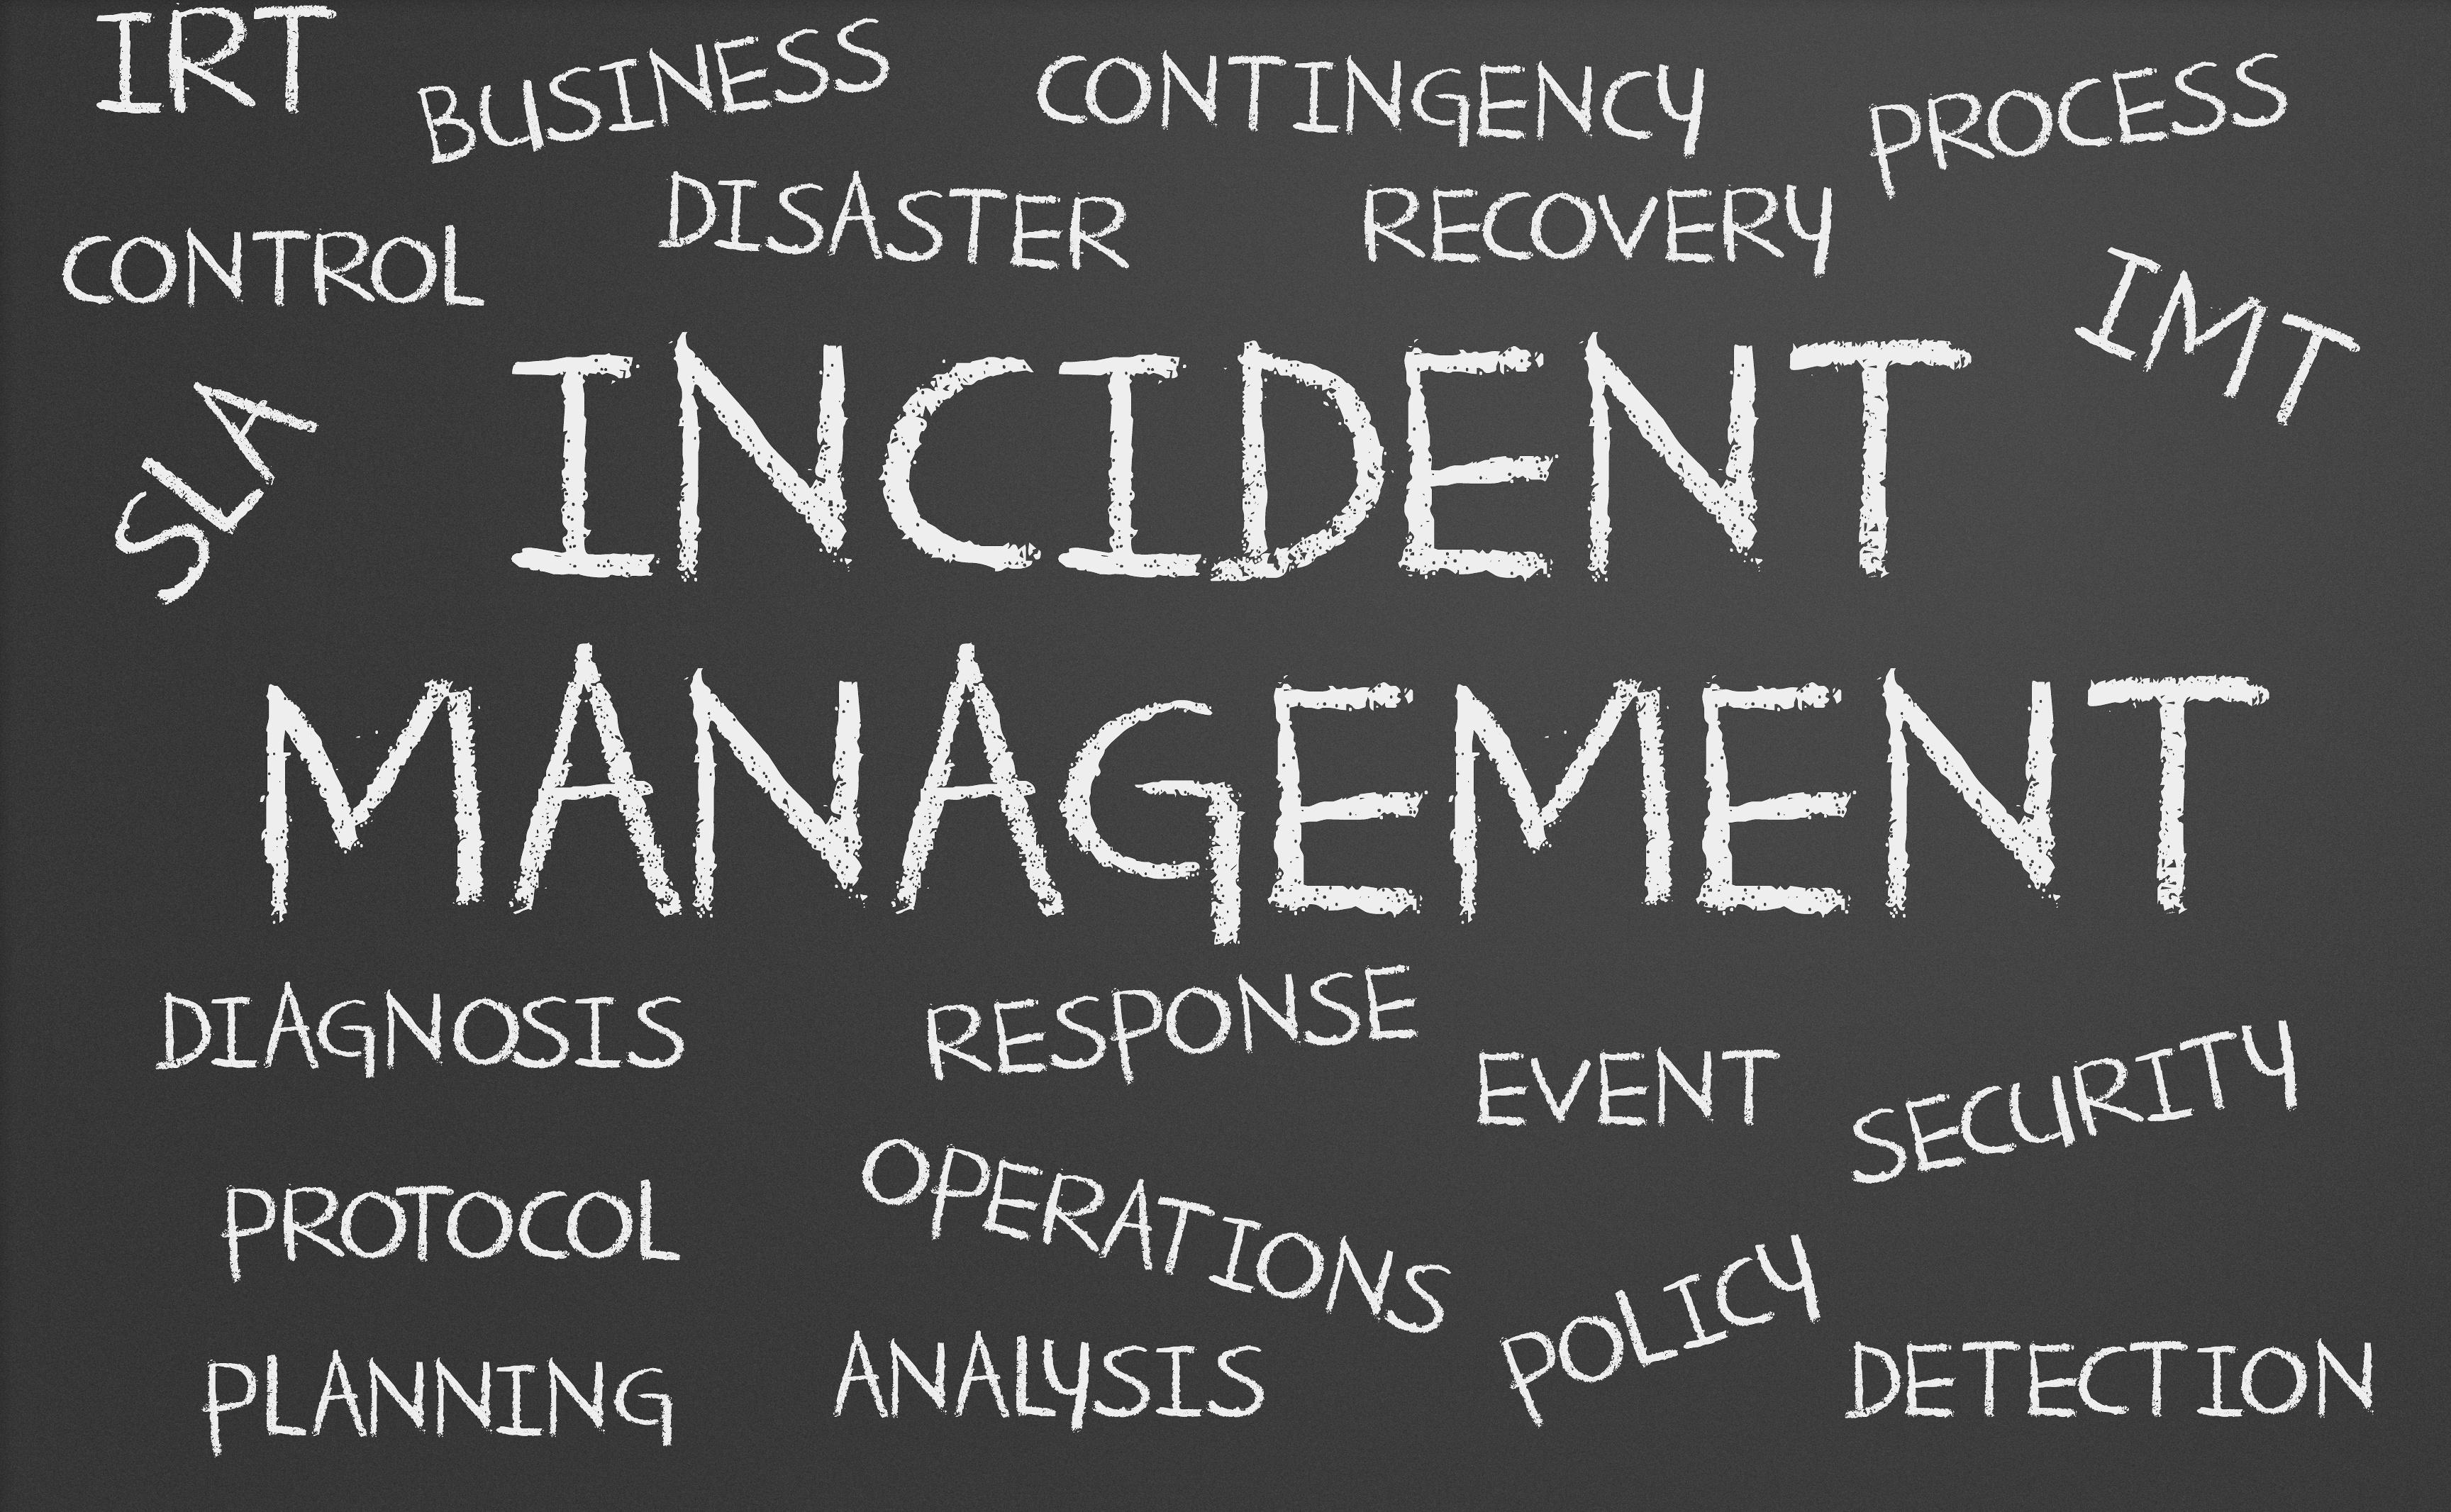 Incident Management istock image.jpg